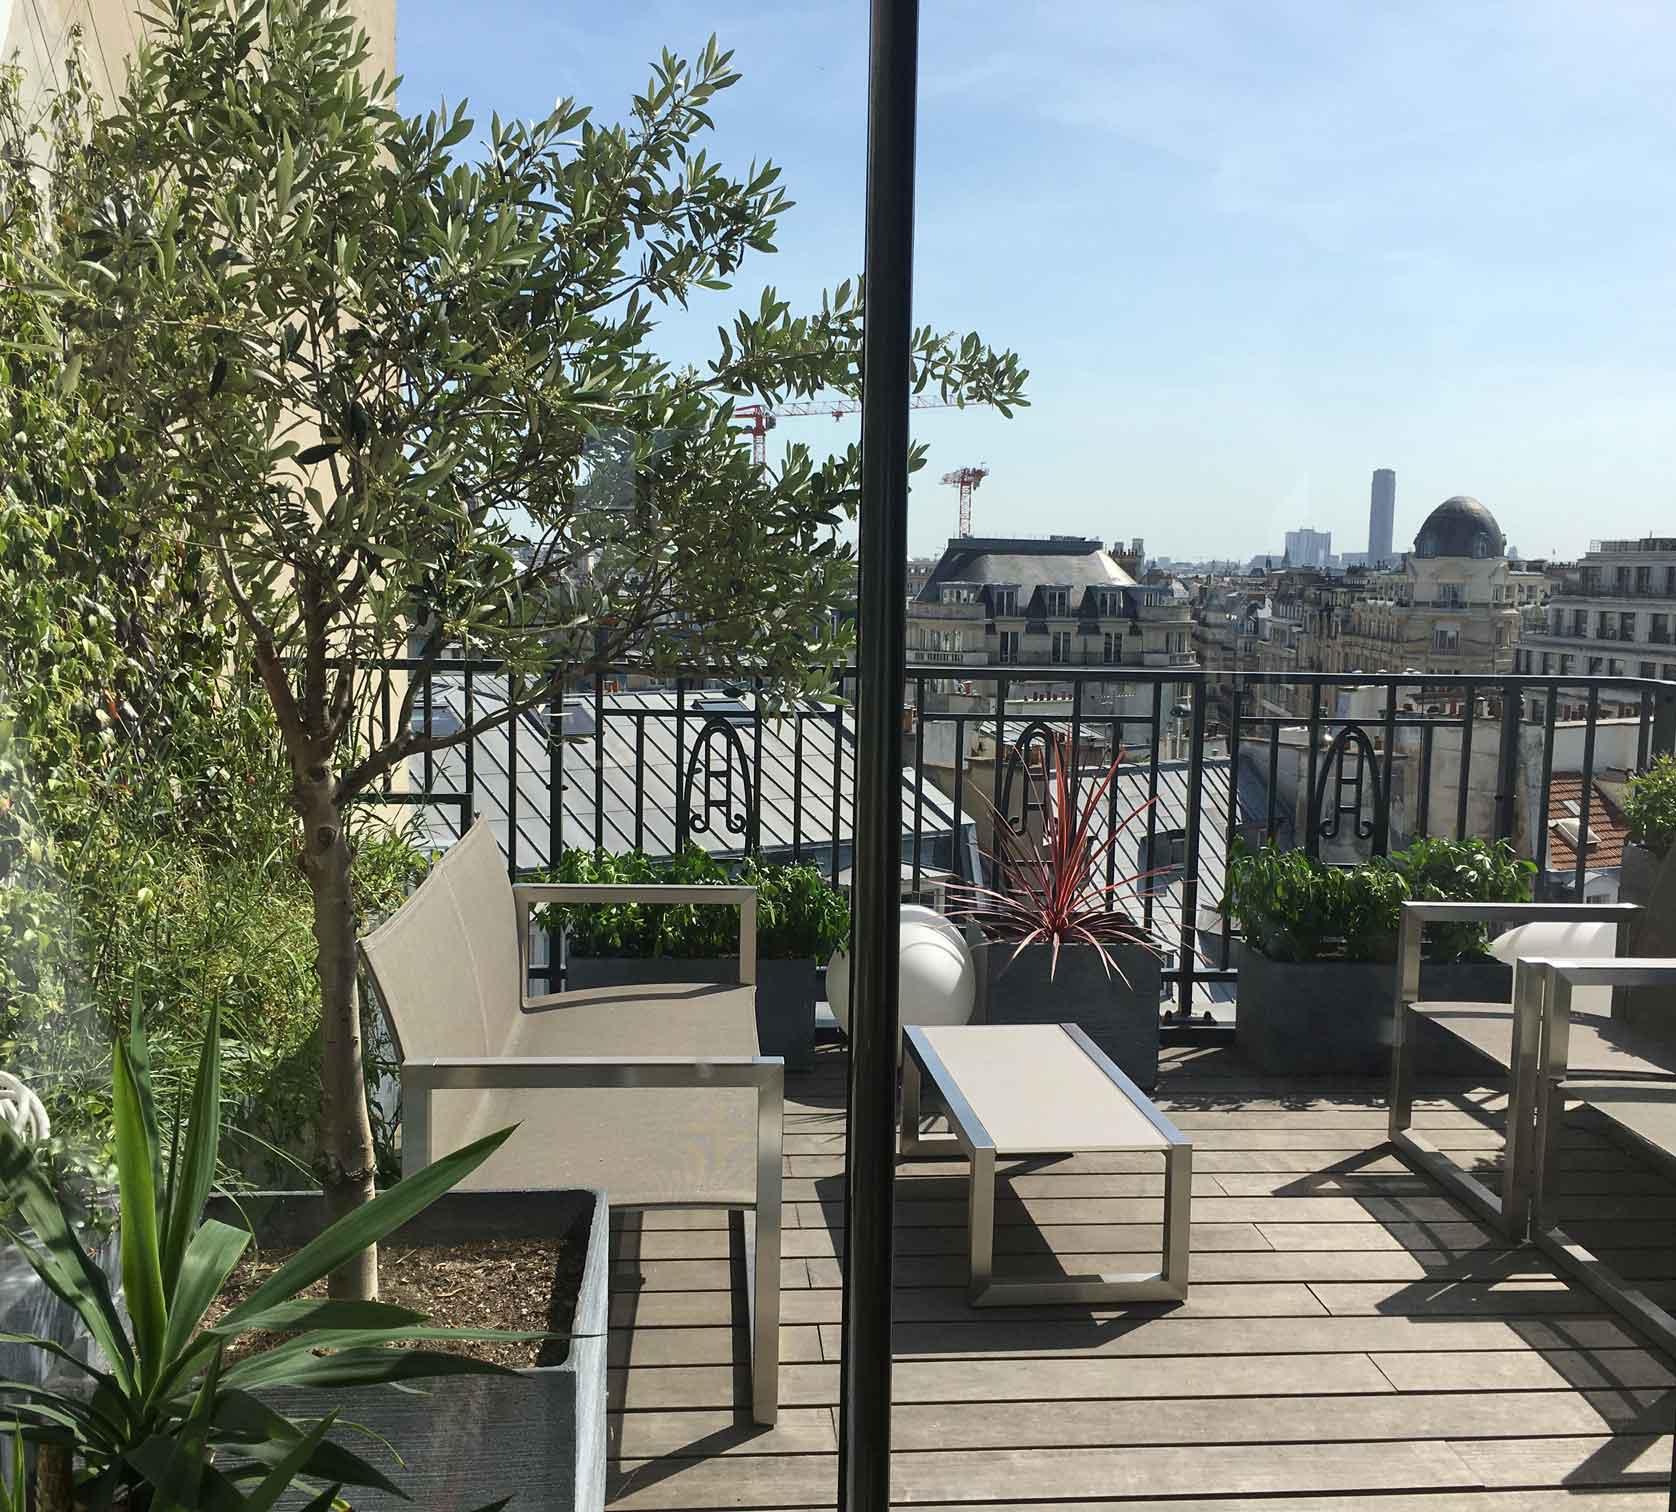 Terrasse-balcon-amenagement-paysager-vegetalisation-paysagiste-paris.jpg